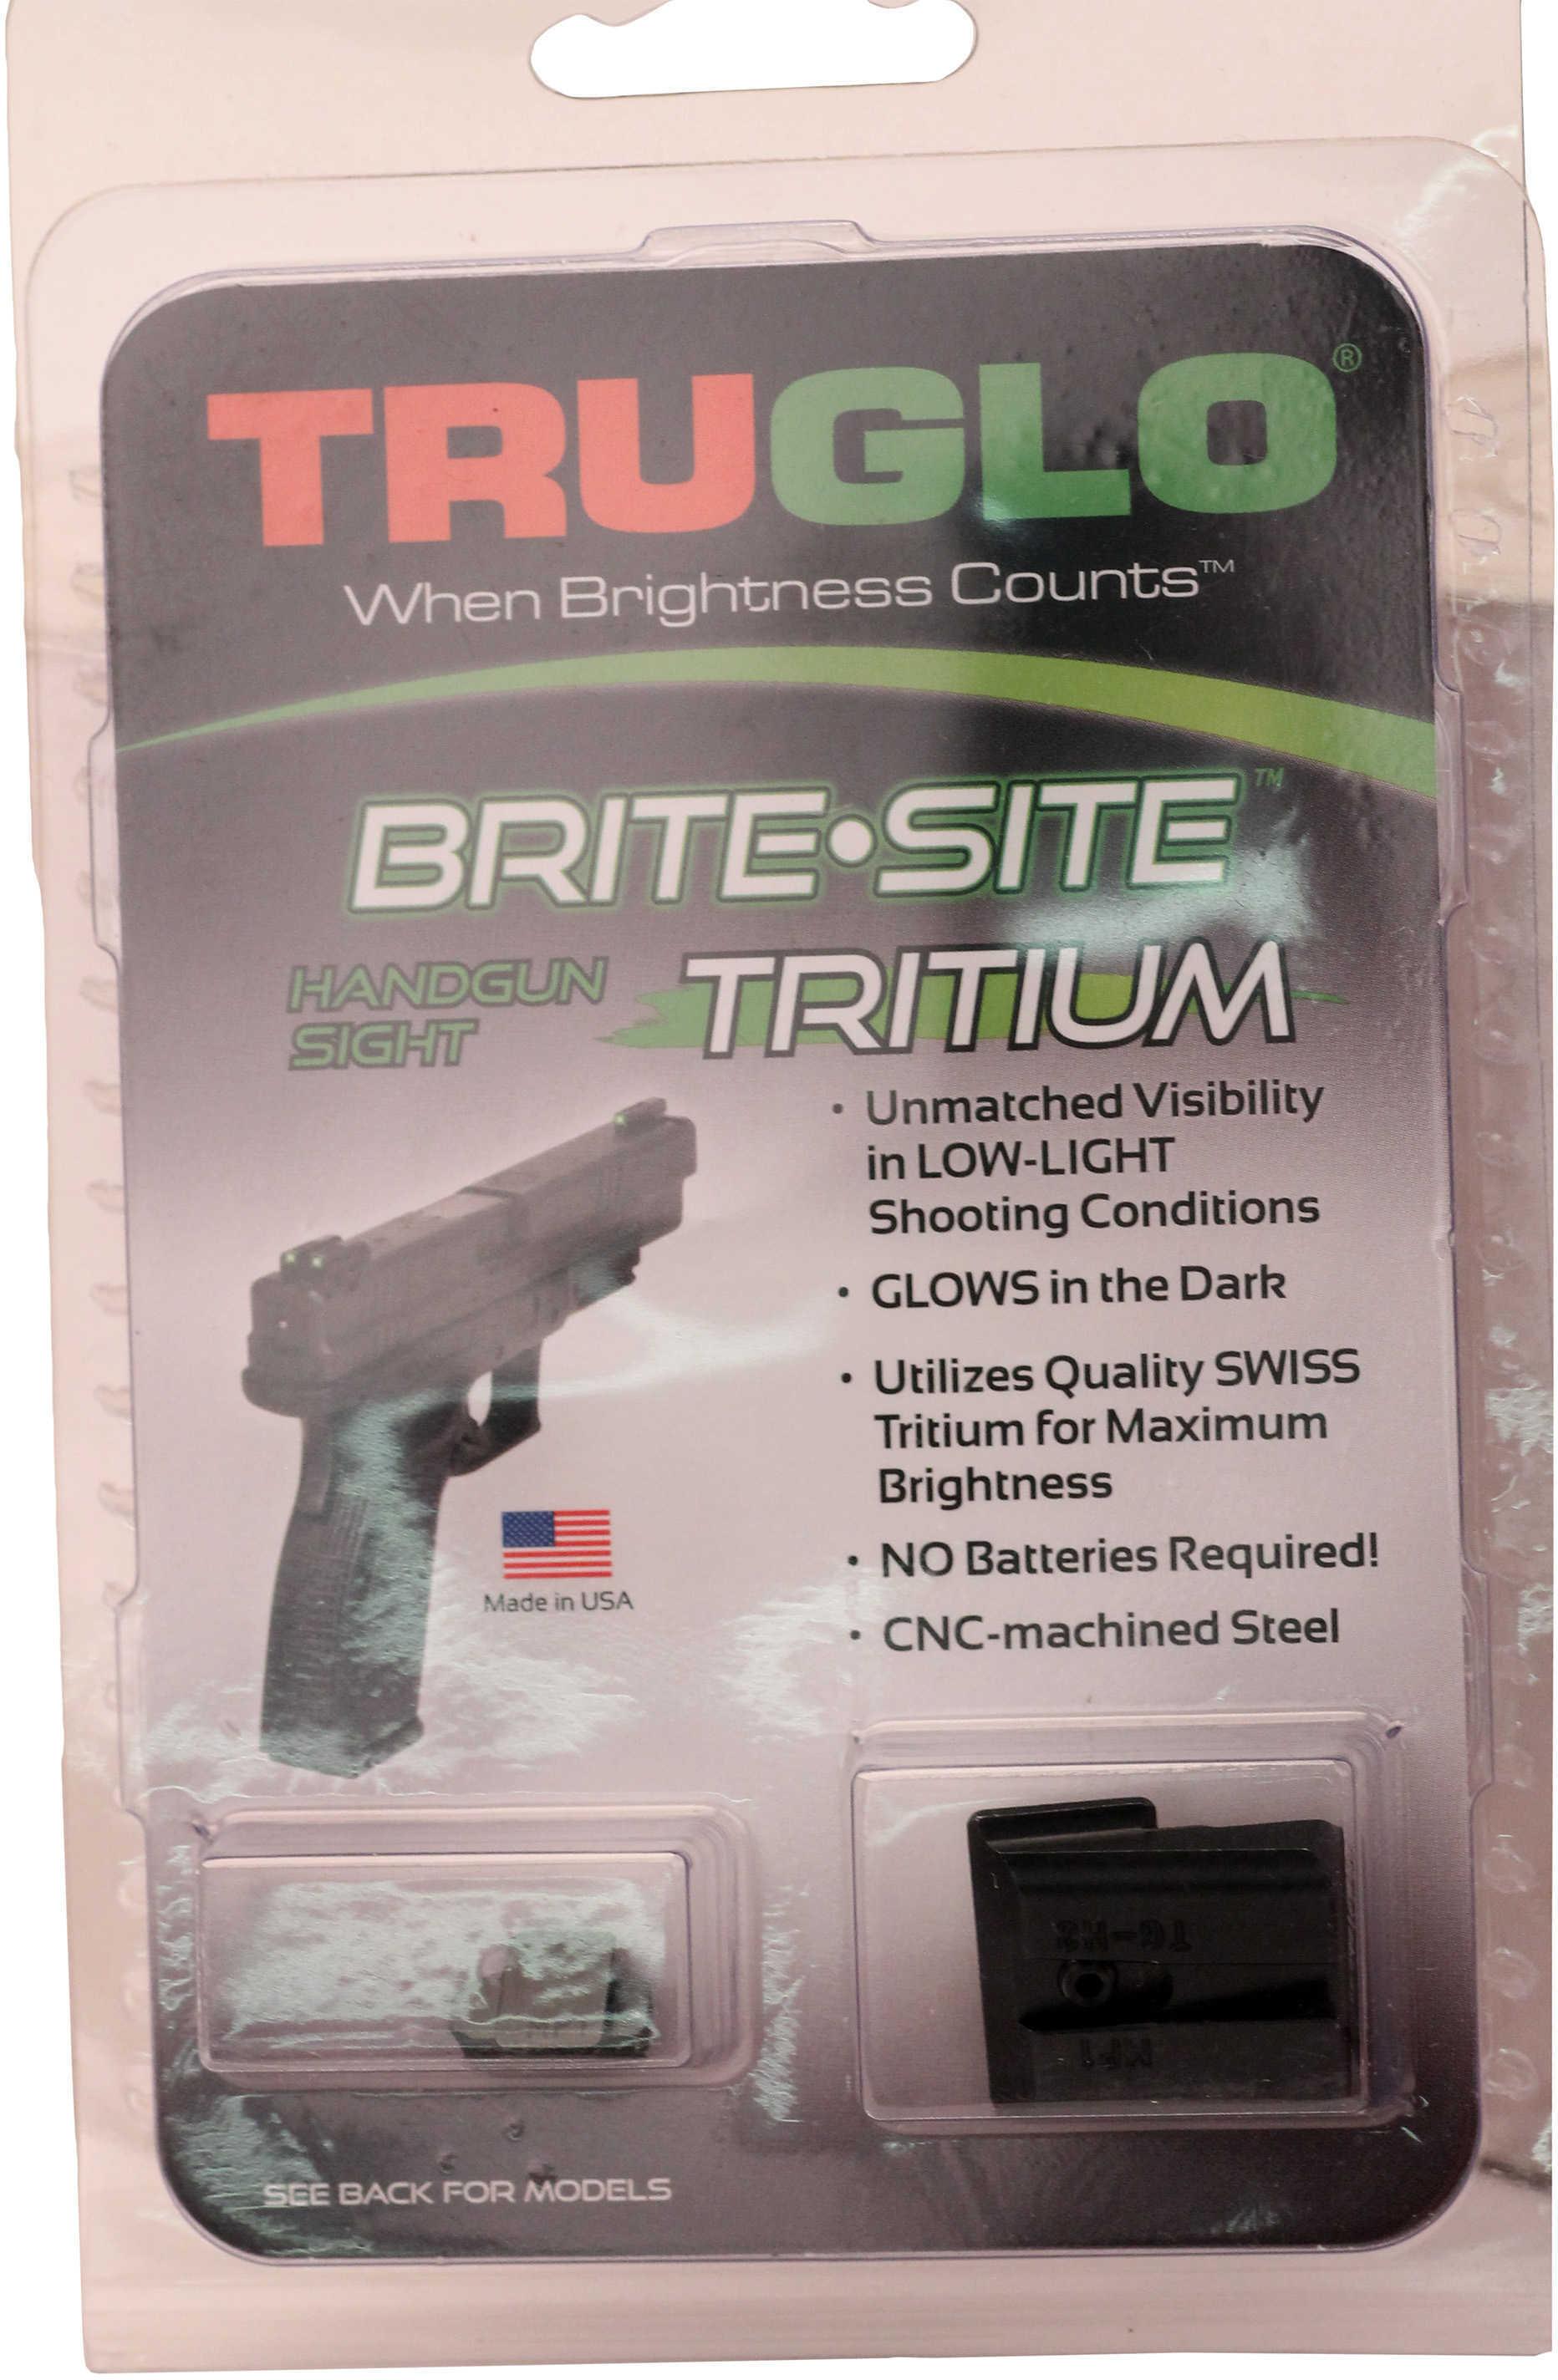 Truglo Brite Site Tritium Handgun Sight Set S&W M&P,Sd9 And Sd40 Md: TG231MP